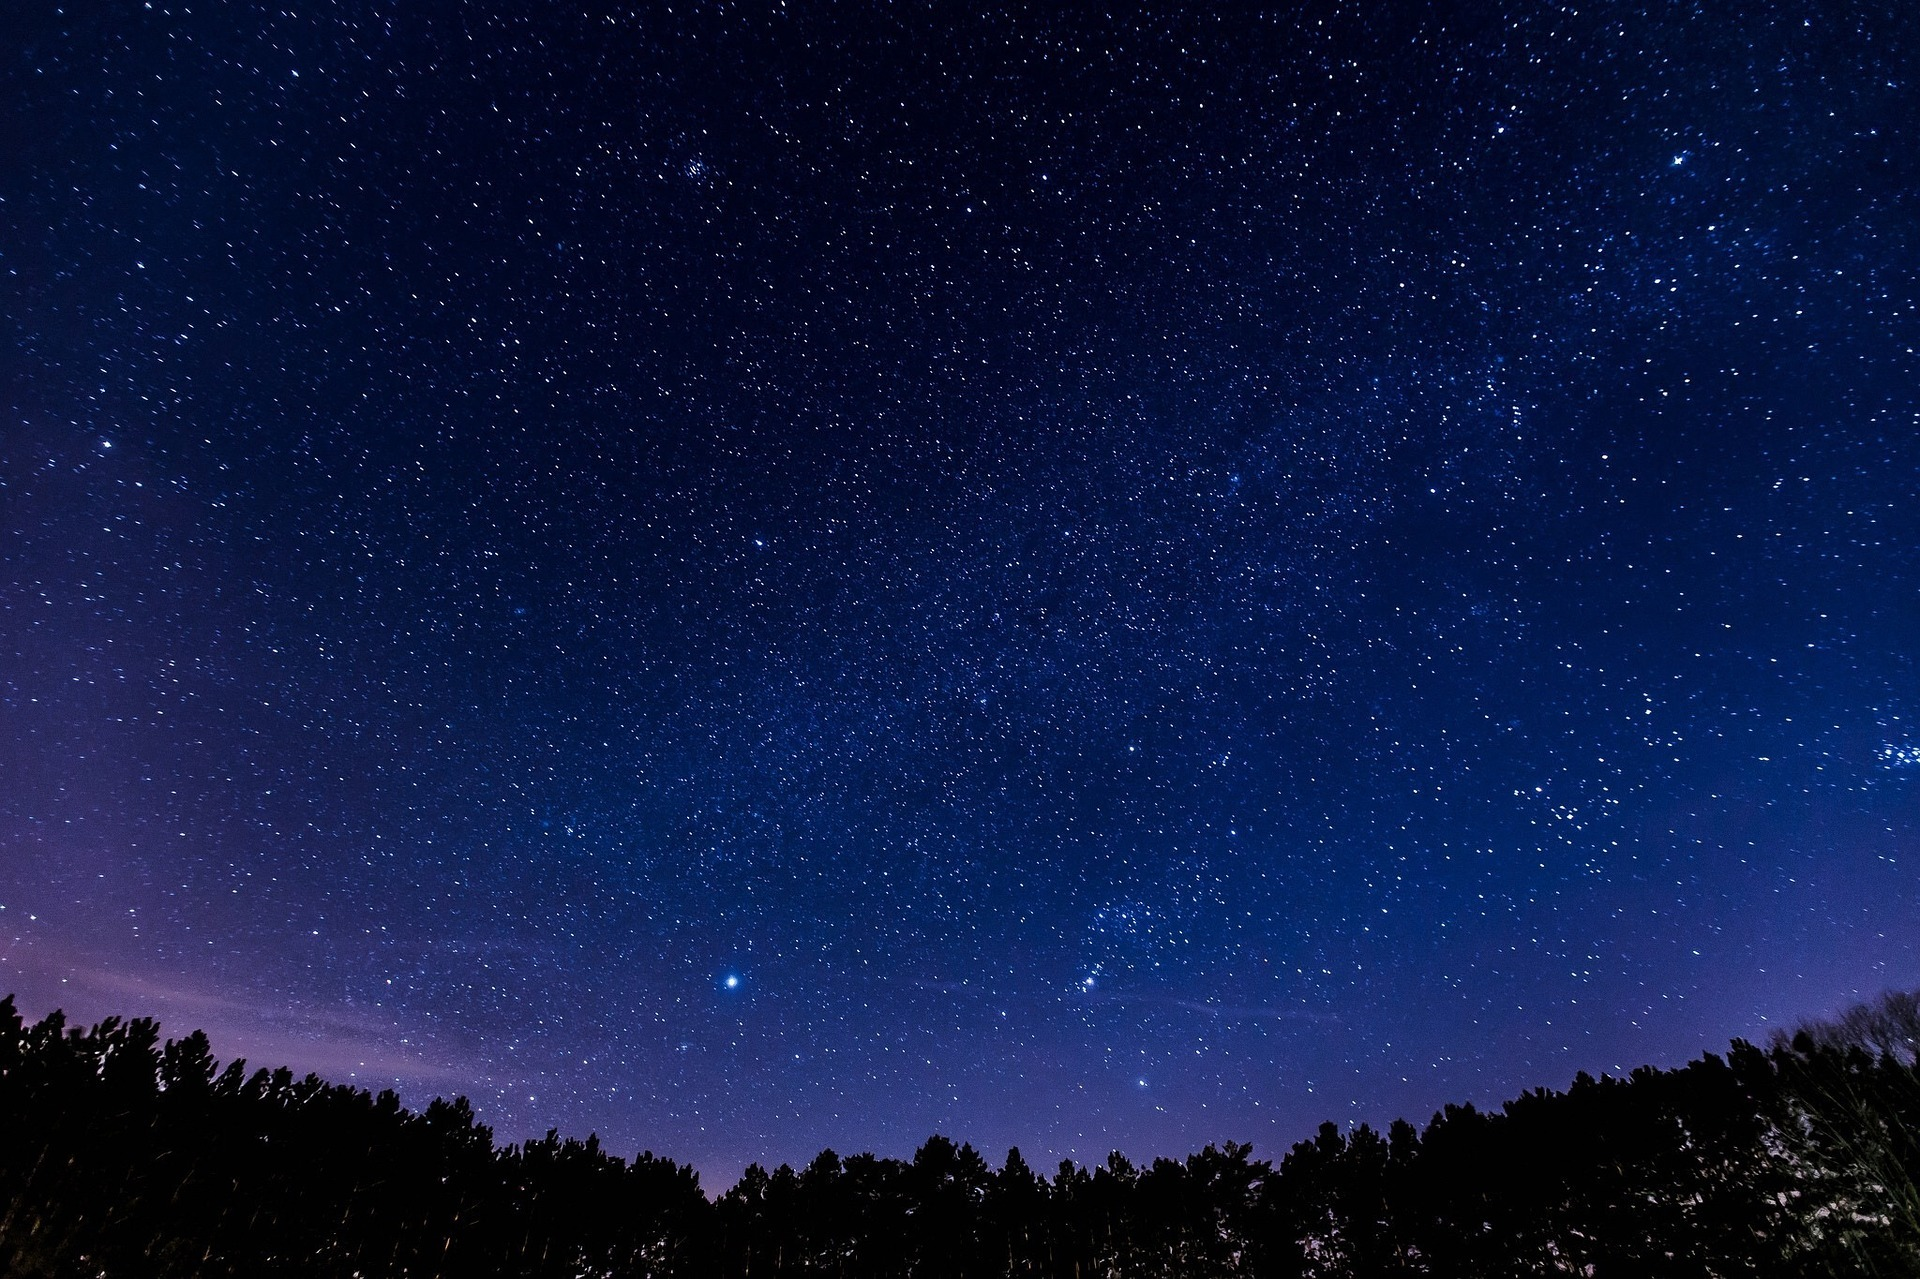 stars-1245902_1920.jpg